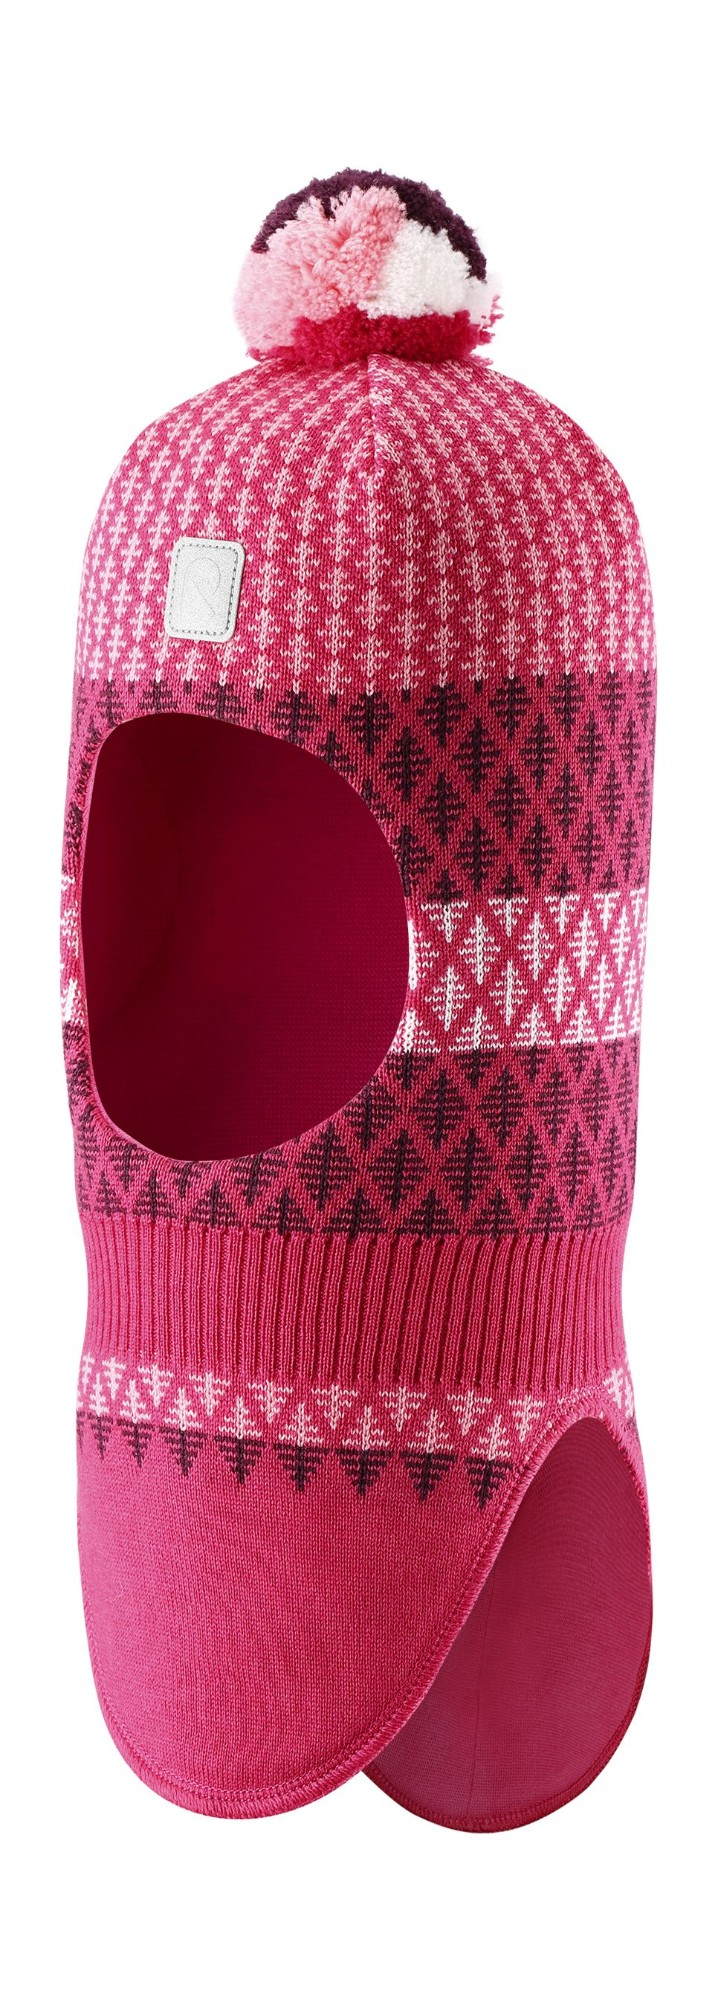 REIMA Valtias Raspberry Pink 46